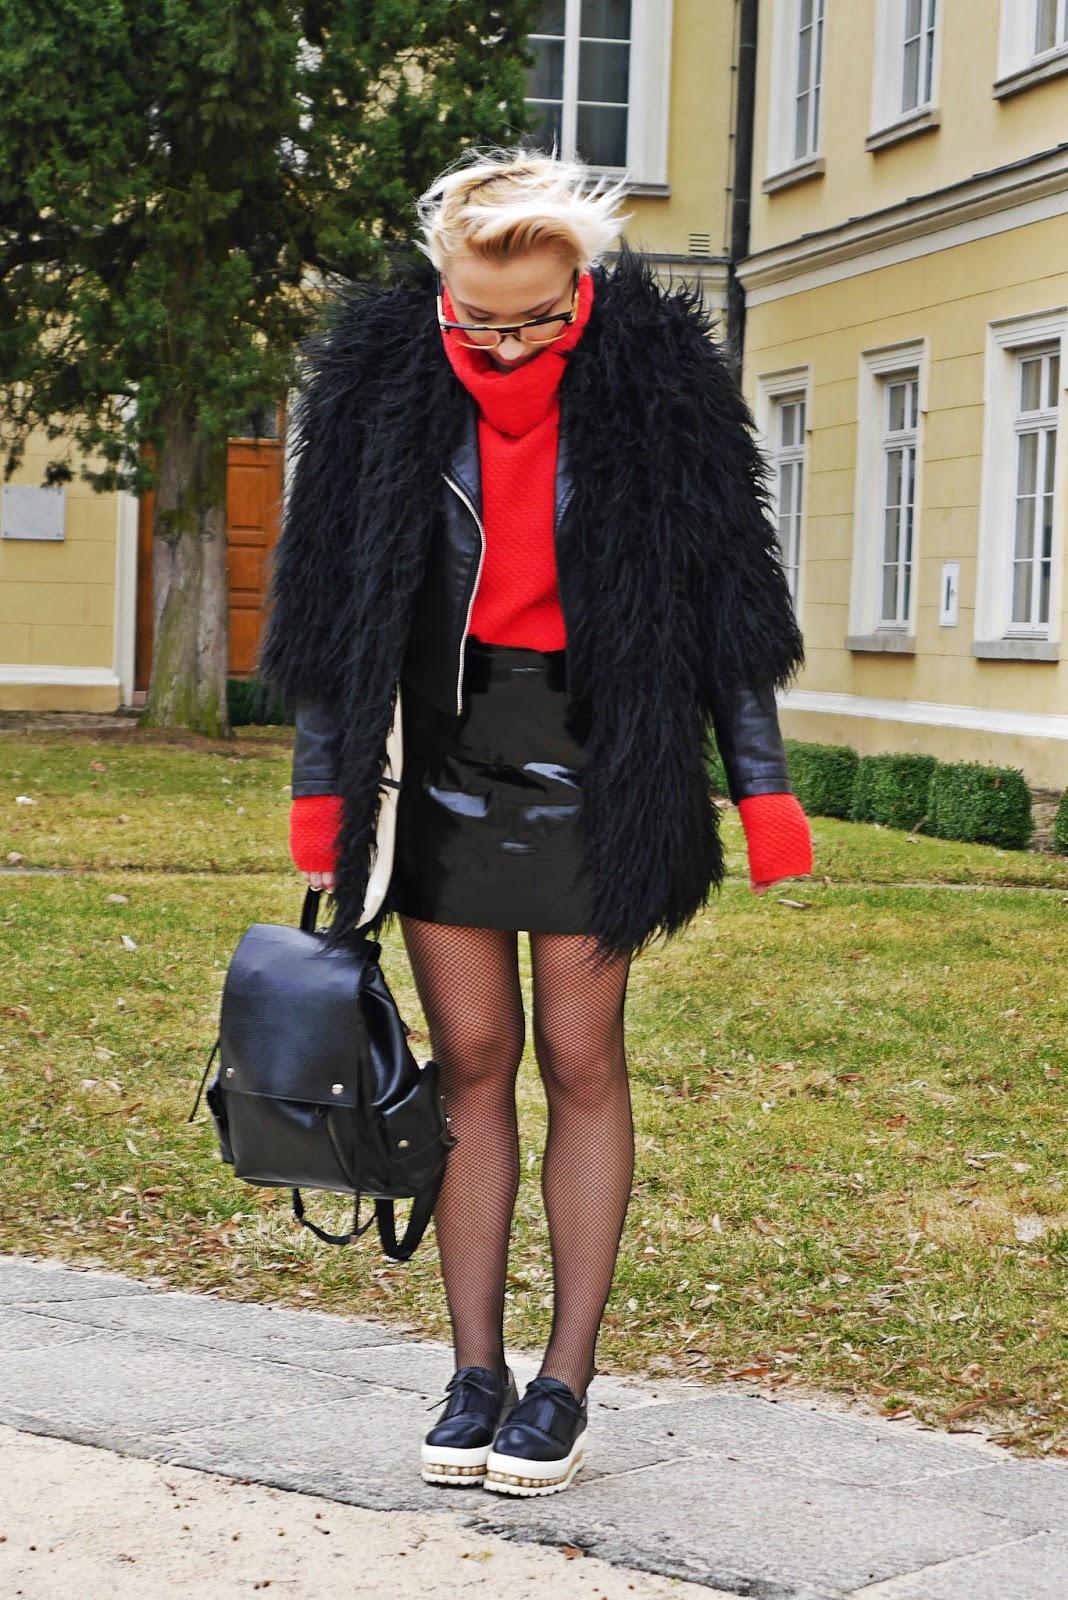 czarne_futerko_spodnica_cerata_look_karyn_blog_160317c